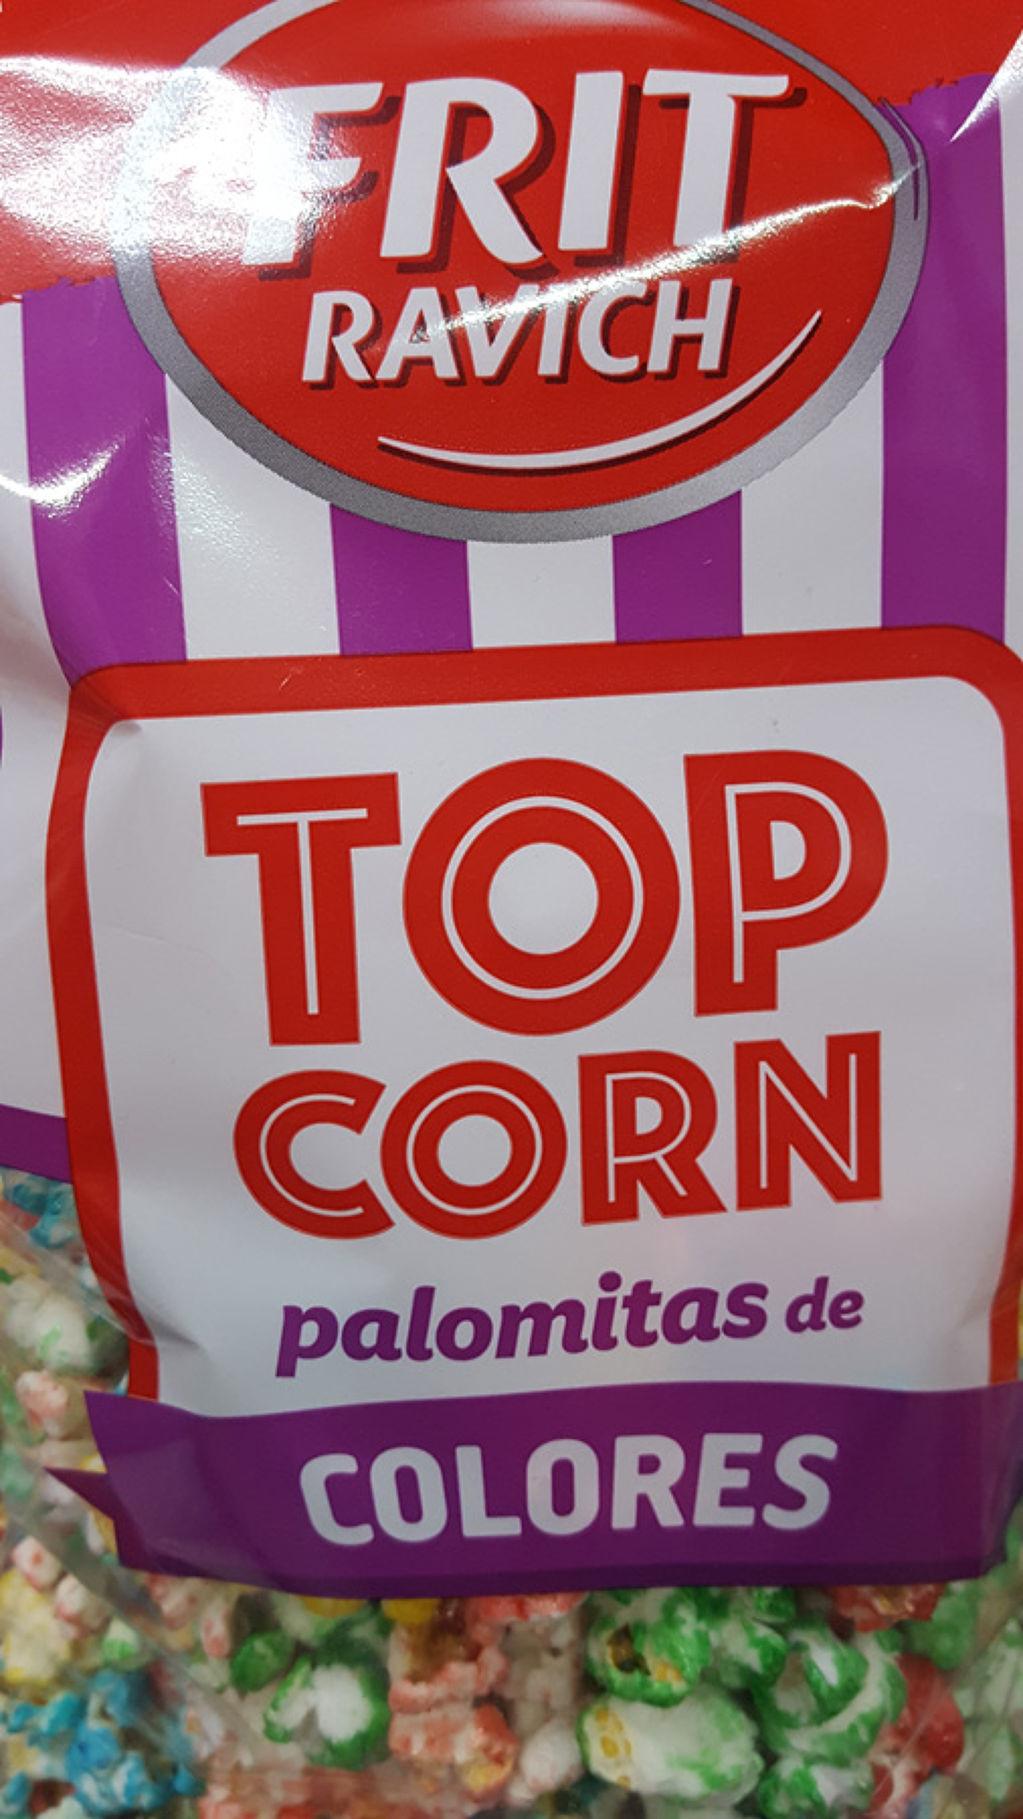 Palomitas Top corn dulces - 8dc1f-20200509_083259.jpg